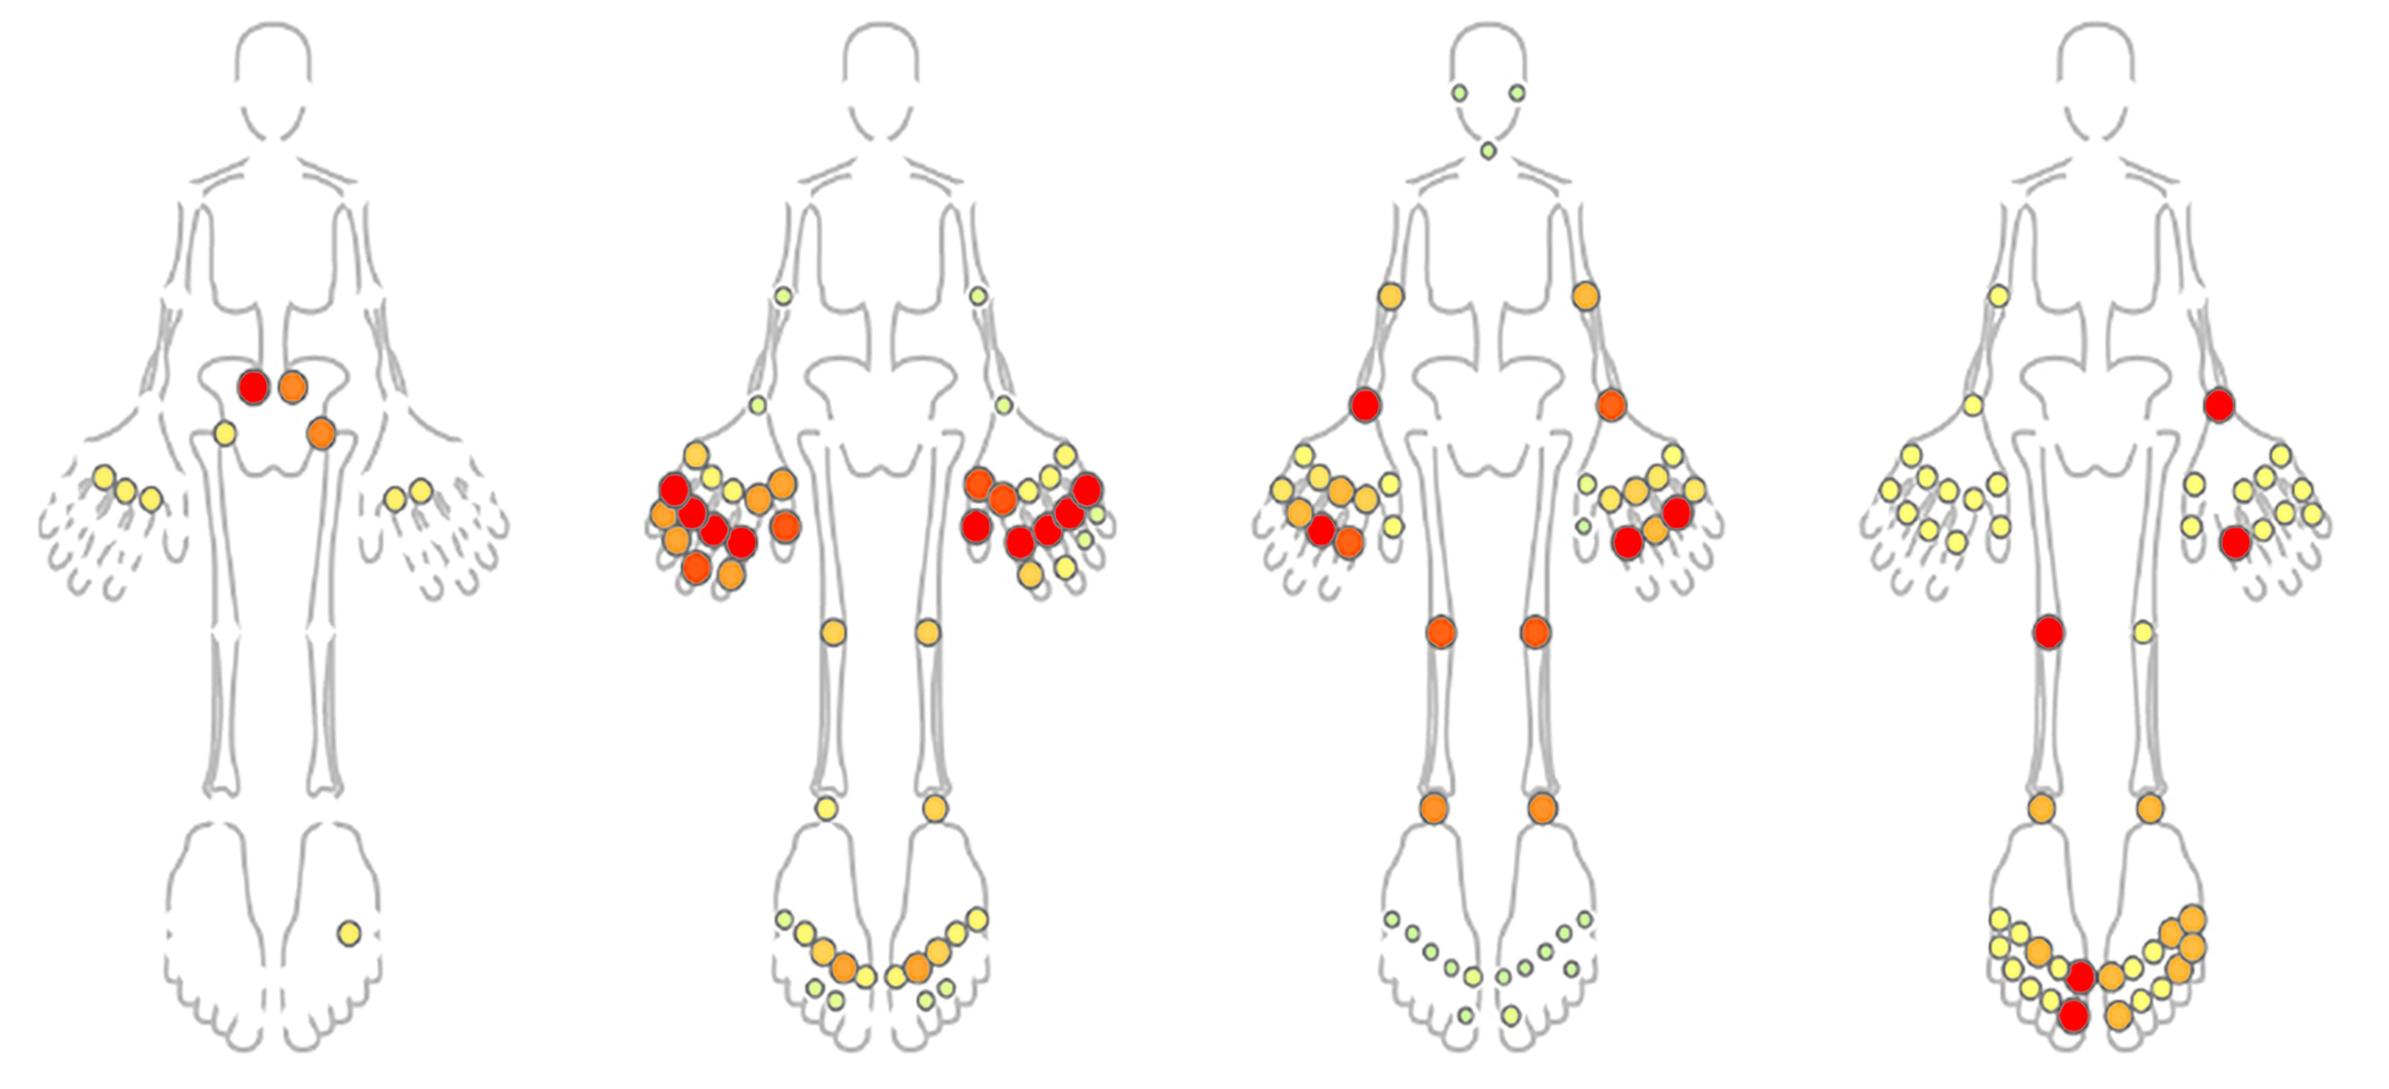 juvenile arthritis patters